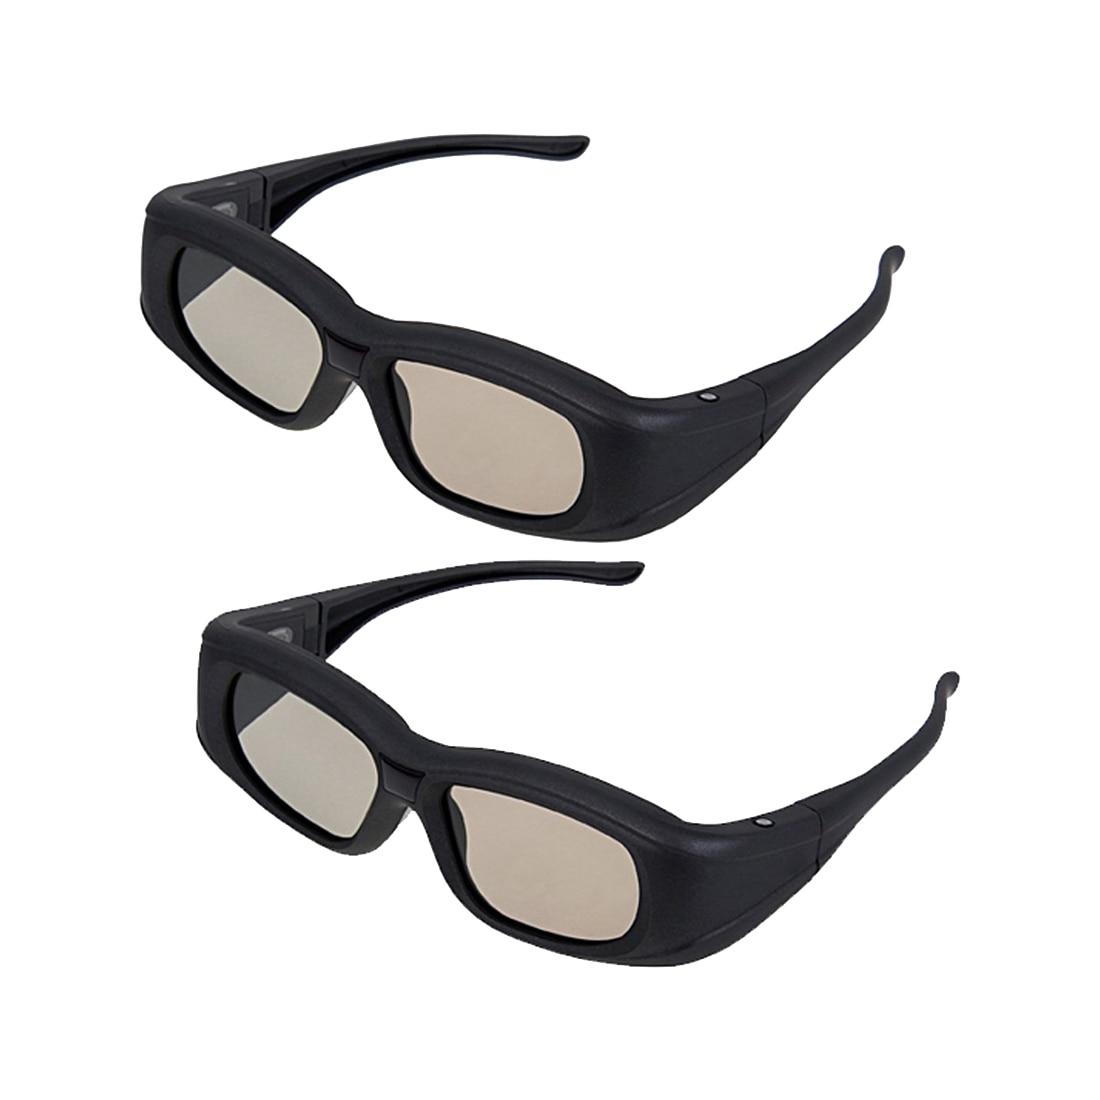 2 X Universal 3D Active Shutter Glasses (Bluetooth) For Sony/Panasonic/Sharp/Toshiba/Mitsubishi/Samsung 3DTV